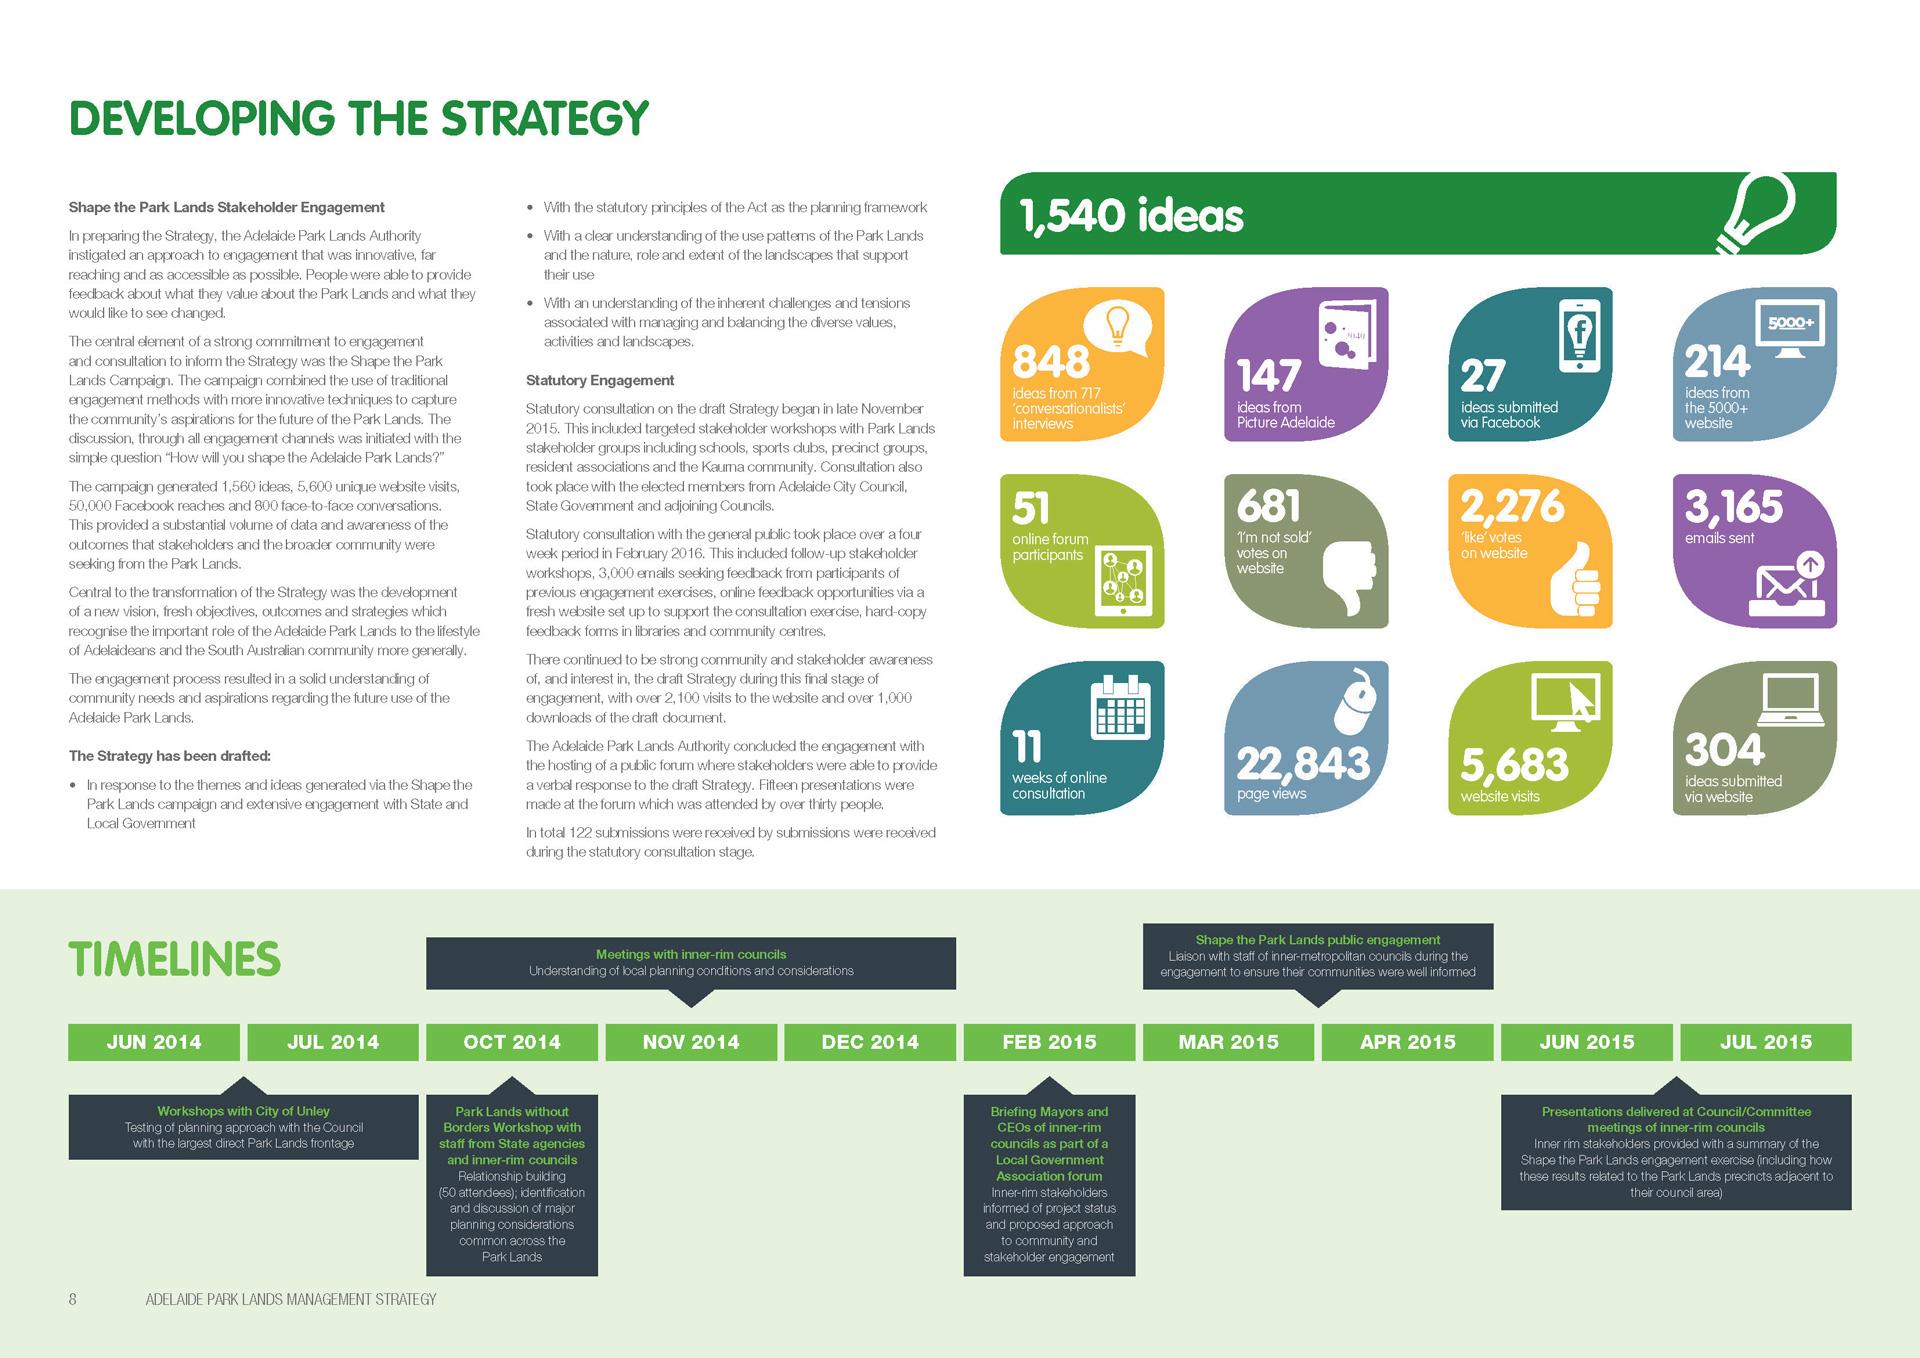 03_Adelaide-Park-Lands-Management-Strategy-December-2016_City-of-Adelaide.jpg